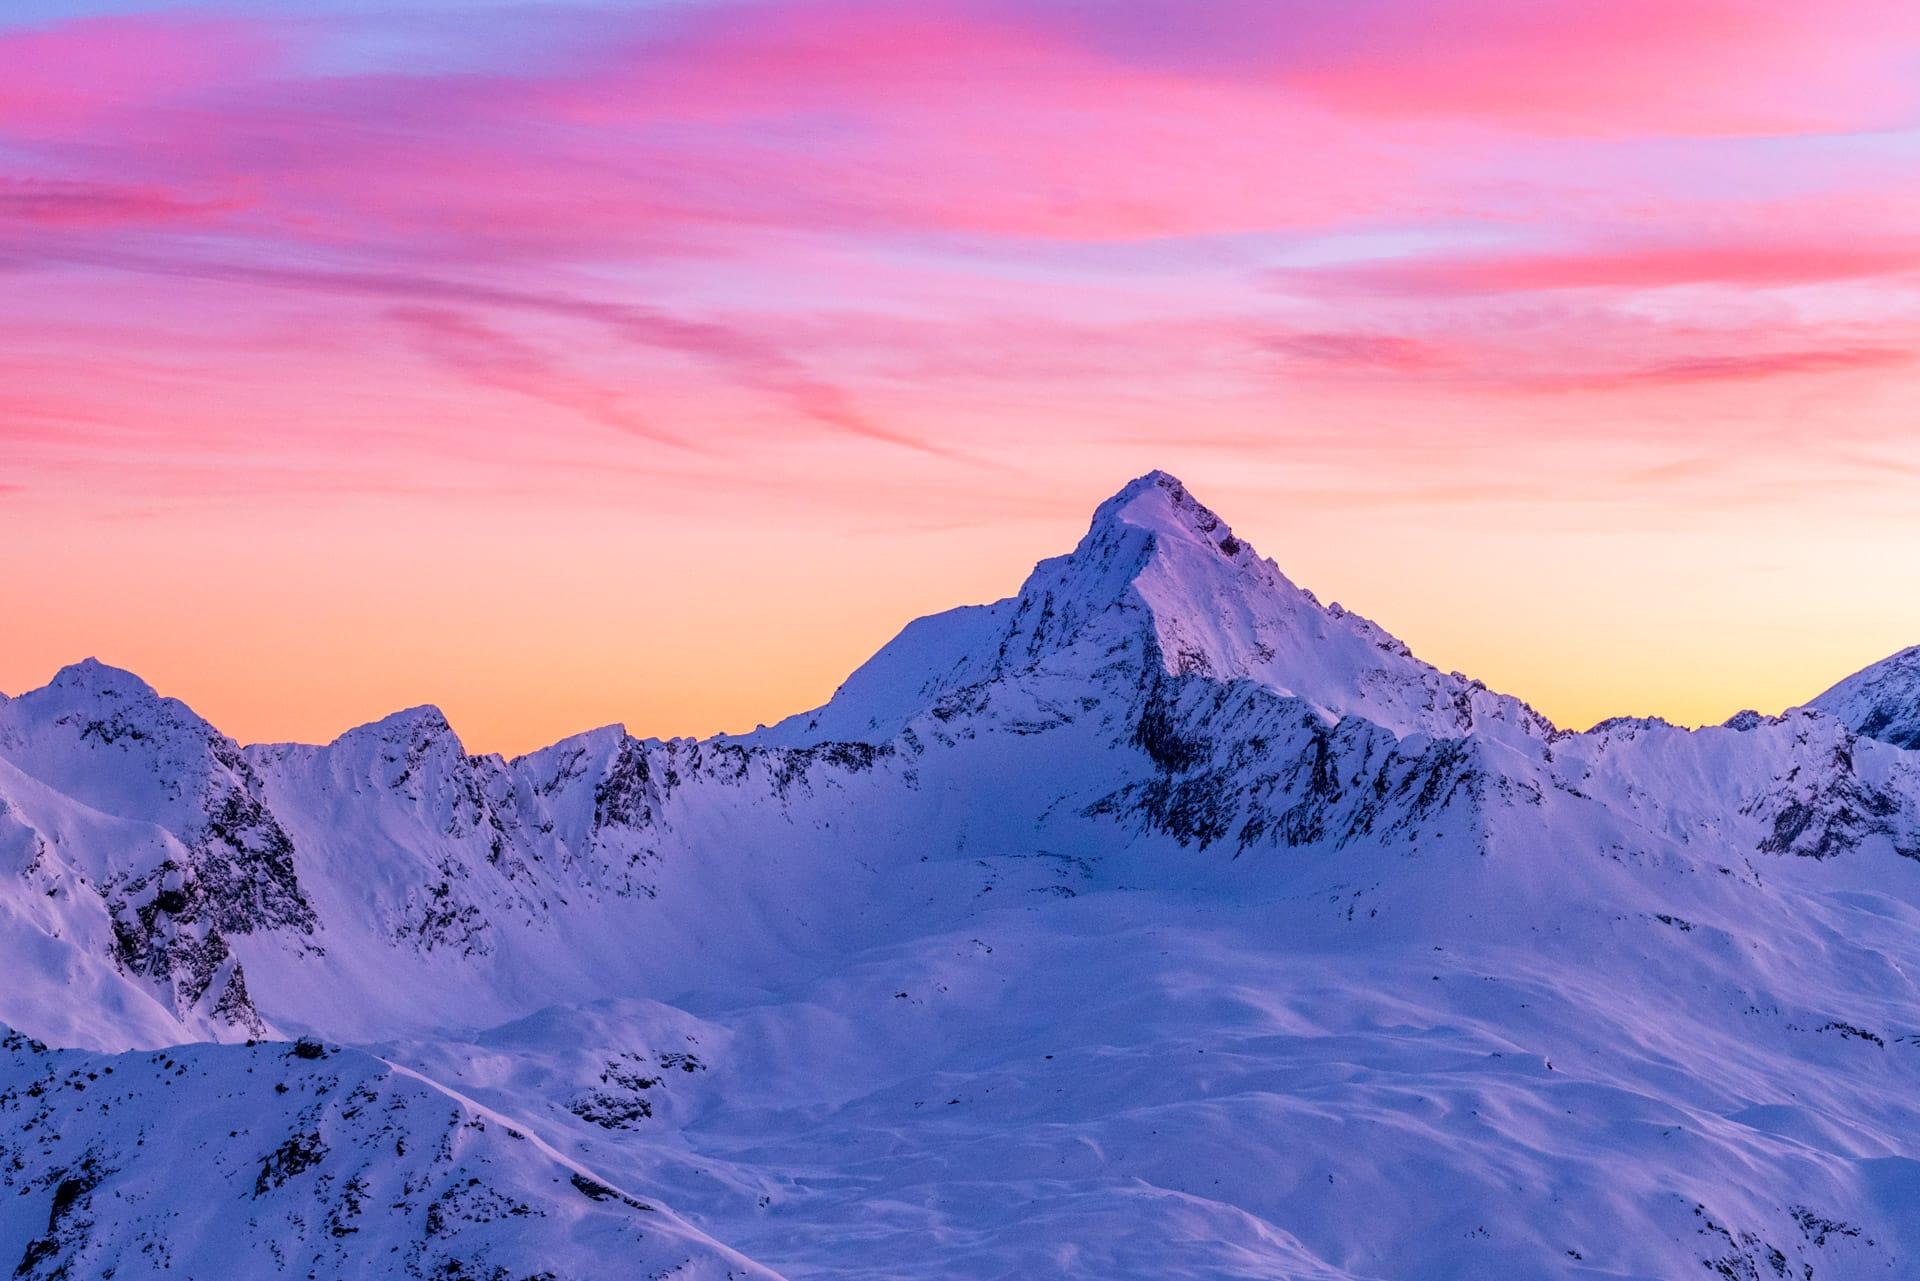 Grand Paradis #W1<br><span id='secondary-title' style='font-size:28px;line-height:34px;color:#fff!important;font-weight:300;display:block;padding-top:34px;'> Week-end de ski de rando itinérant au dessus de Cogne</span>